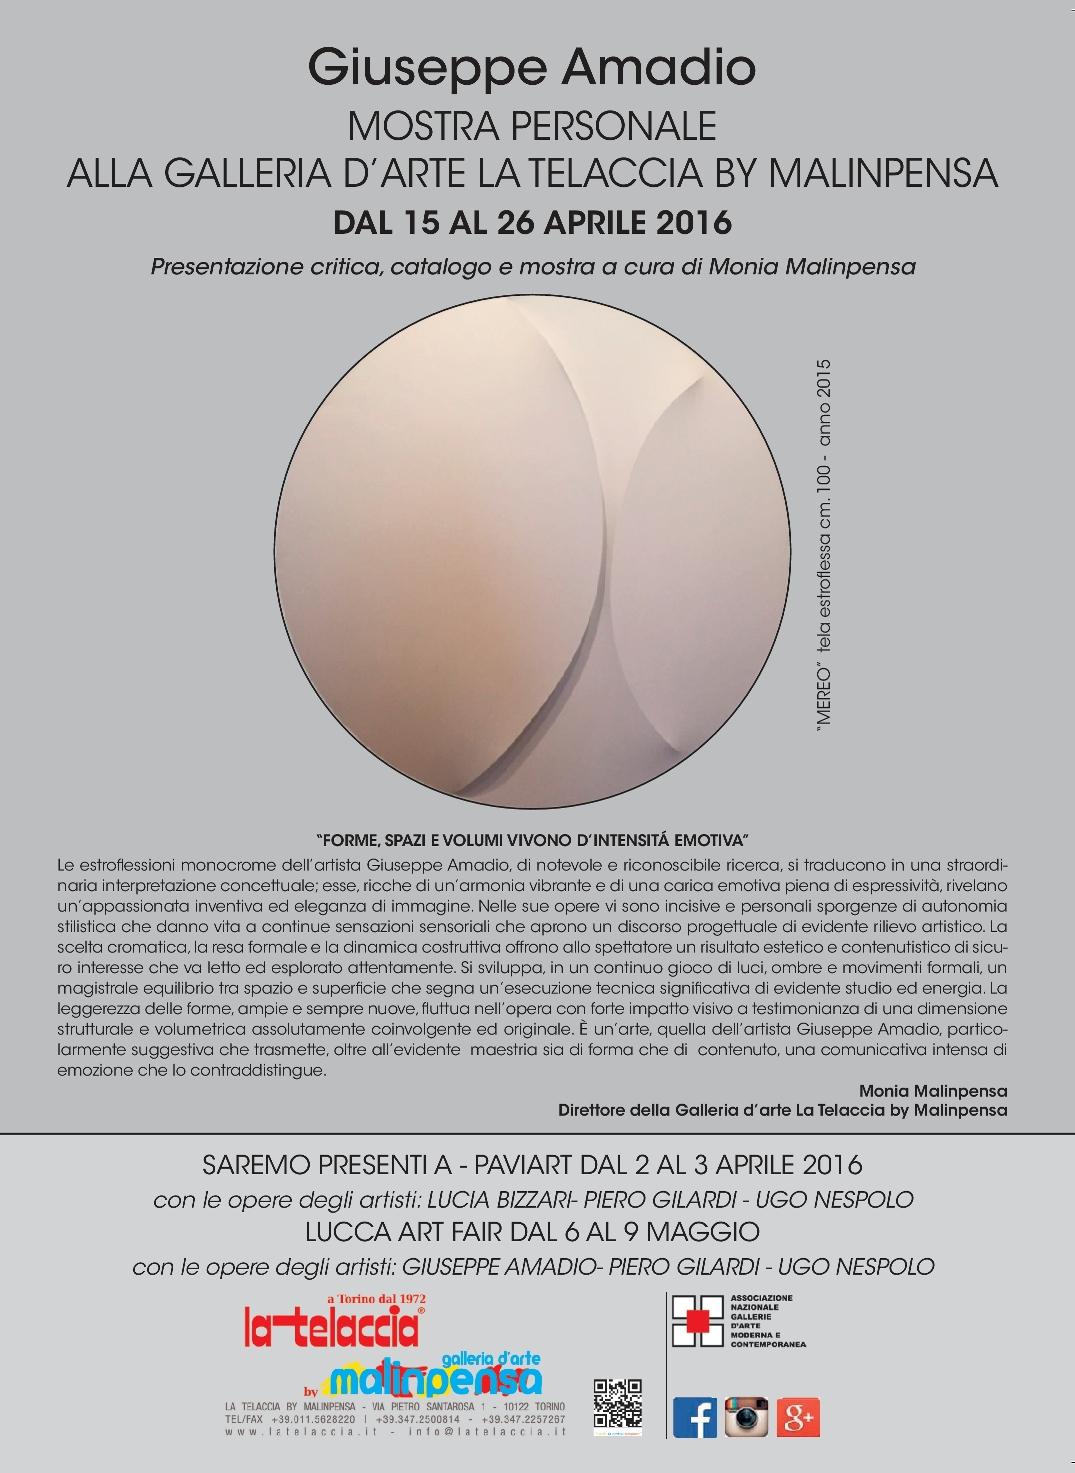 AMADIO- ARTE CAIRO DI APRILE 2016.jpg